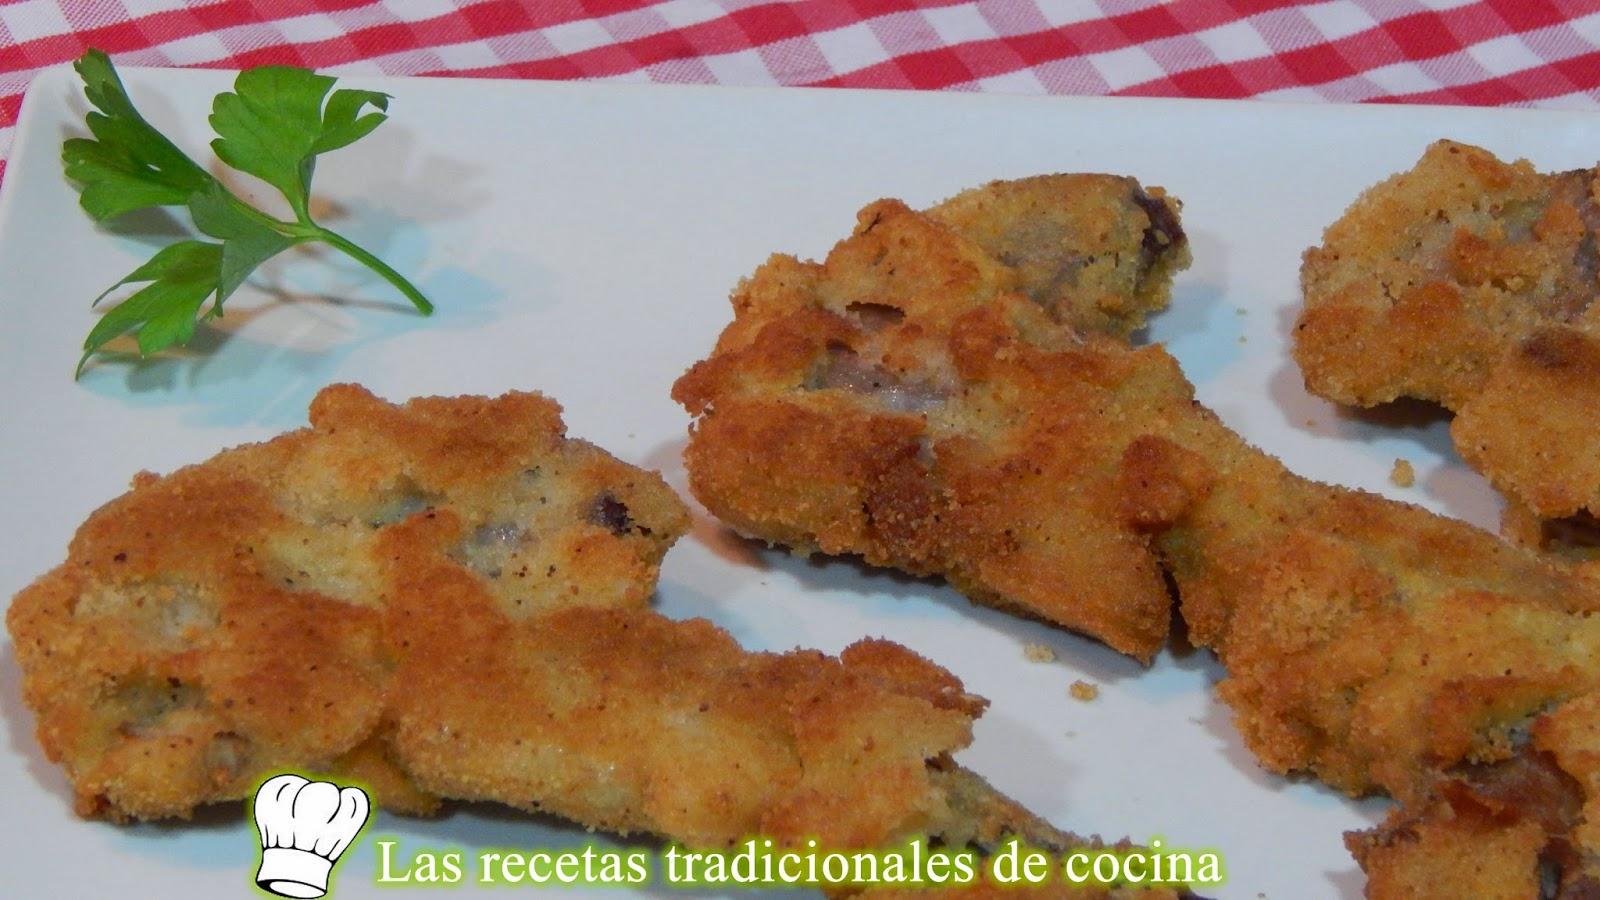 Chuletas de cordero empanadas con bechamel